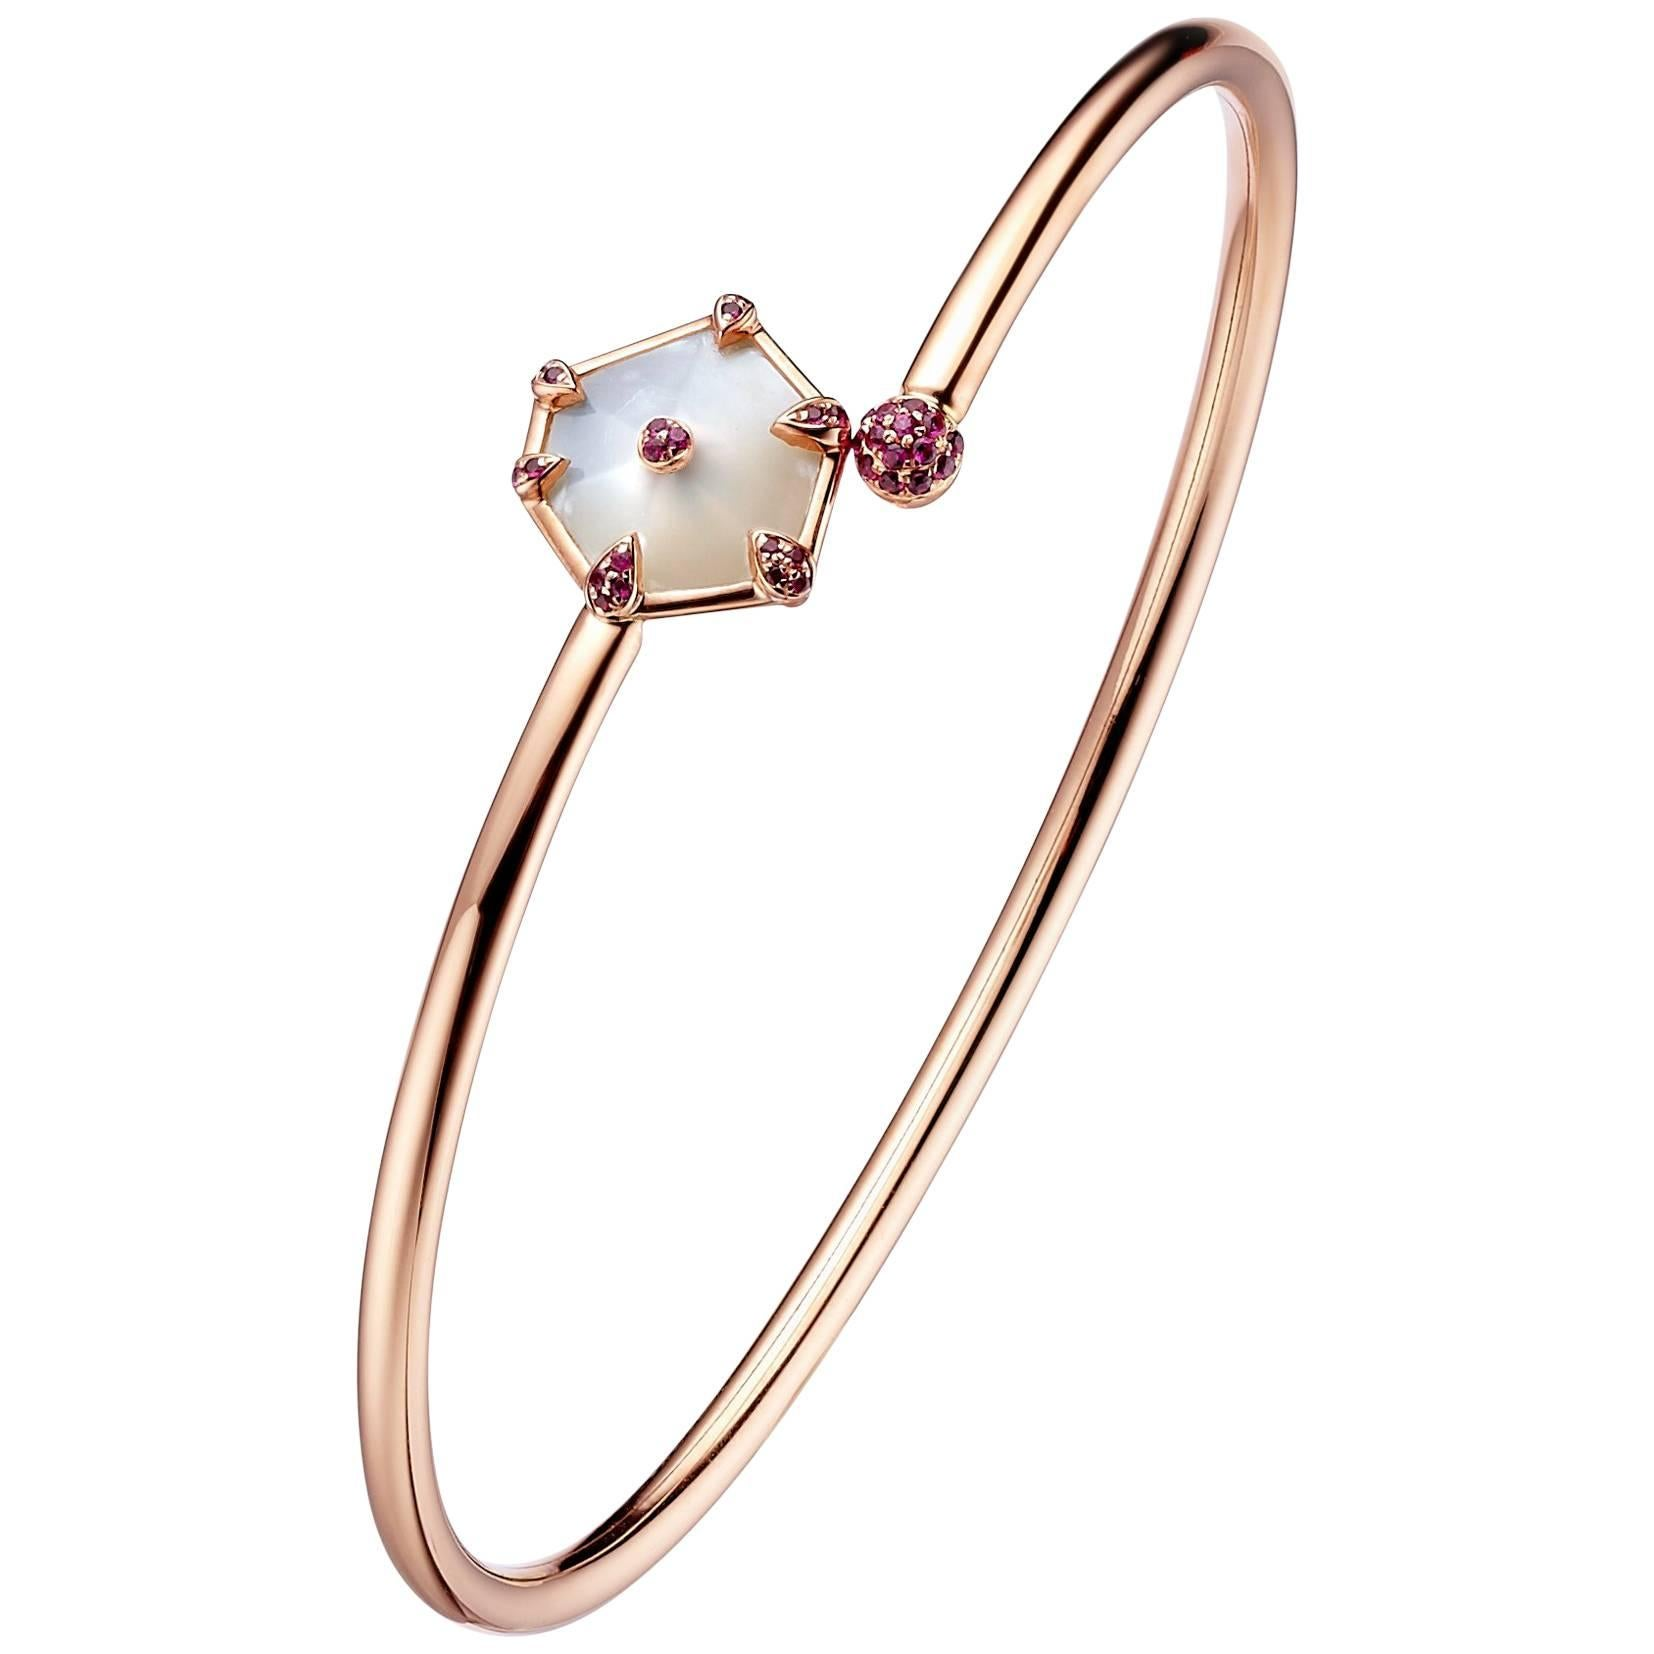 Fei Liu Mother of Pearl Pink Sapphire Bangle Bracelet